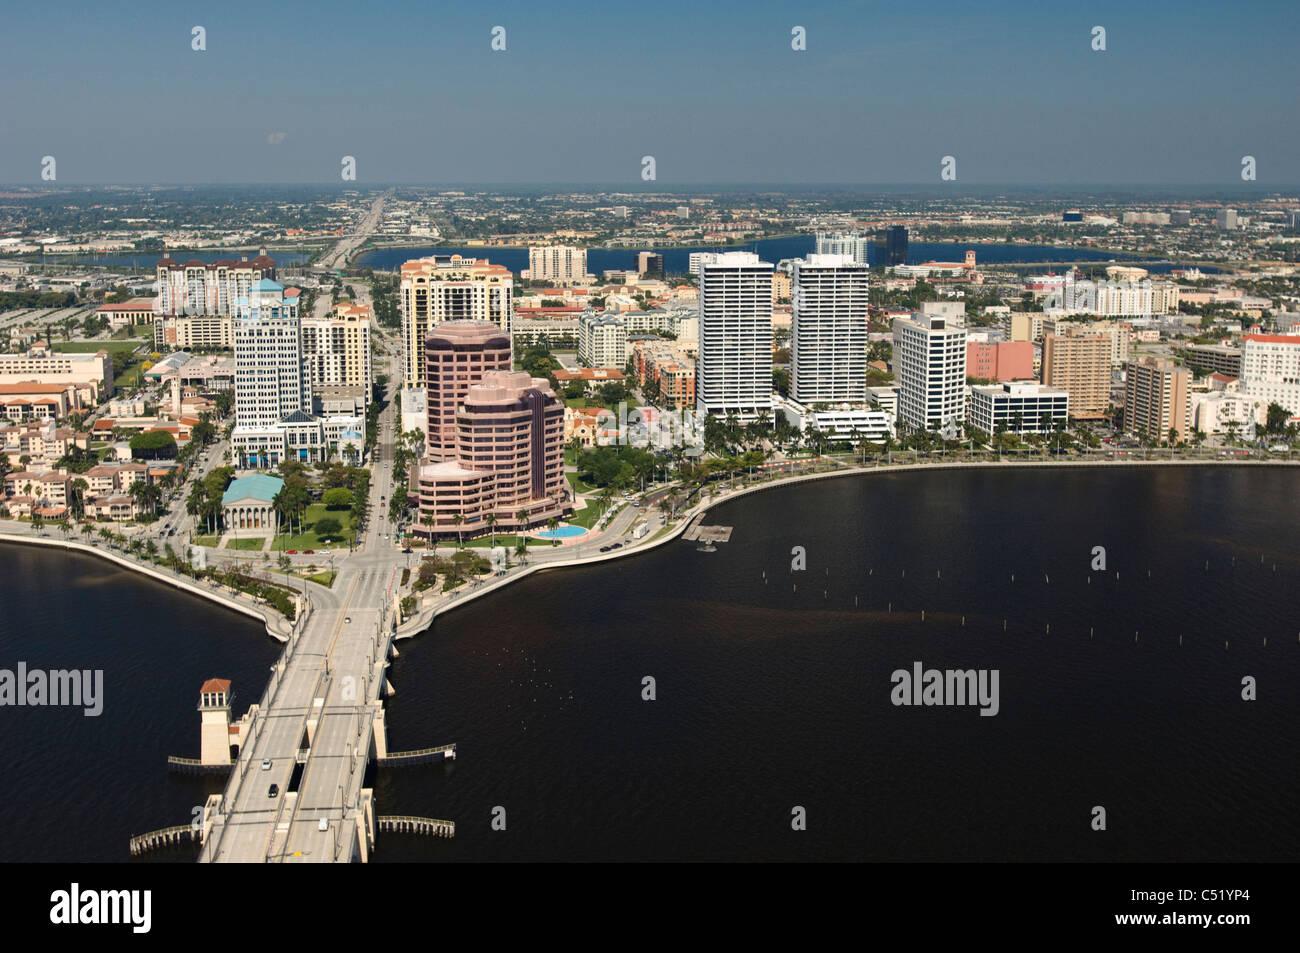 West Palm Beach , Florida downtown city buildings and Royal PArk Bridge - Stock Image